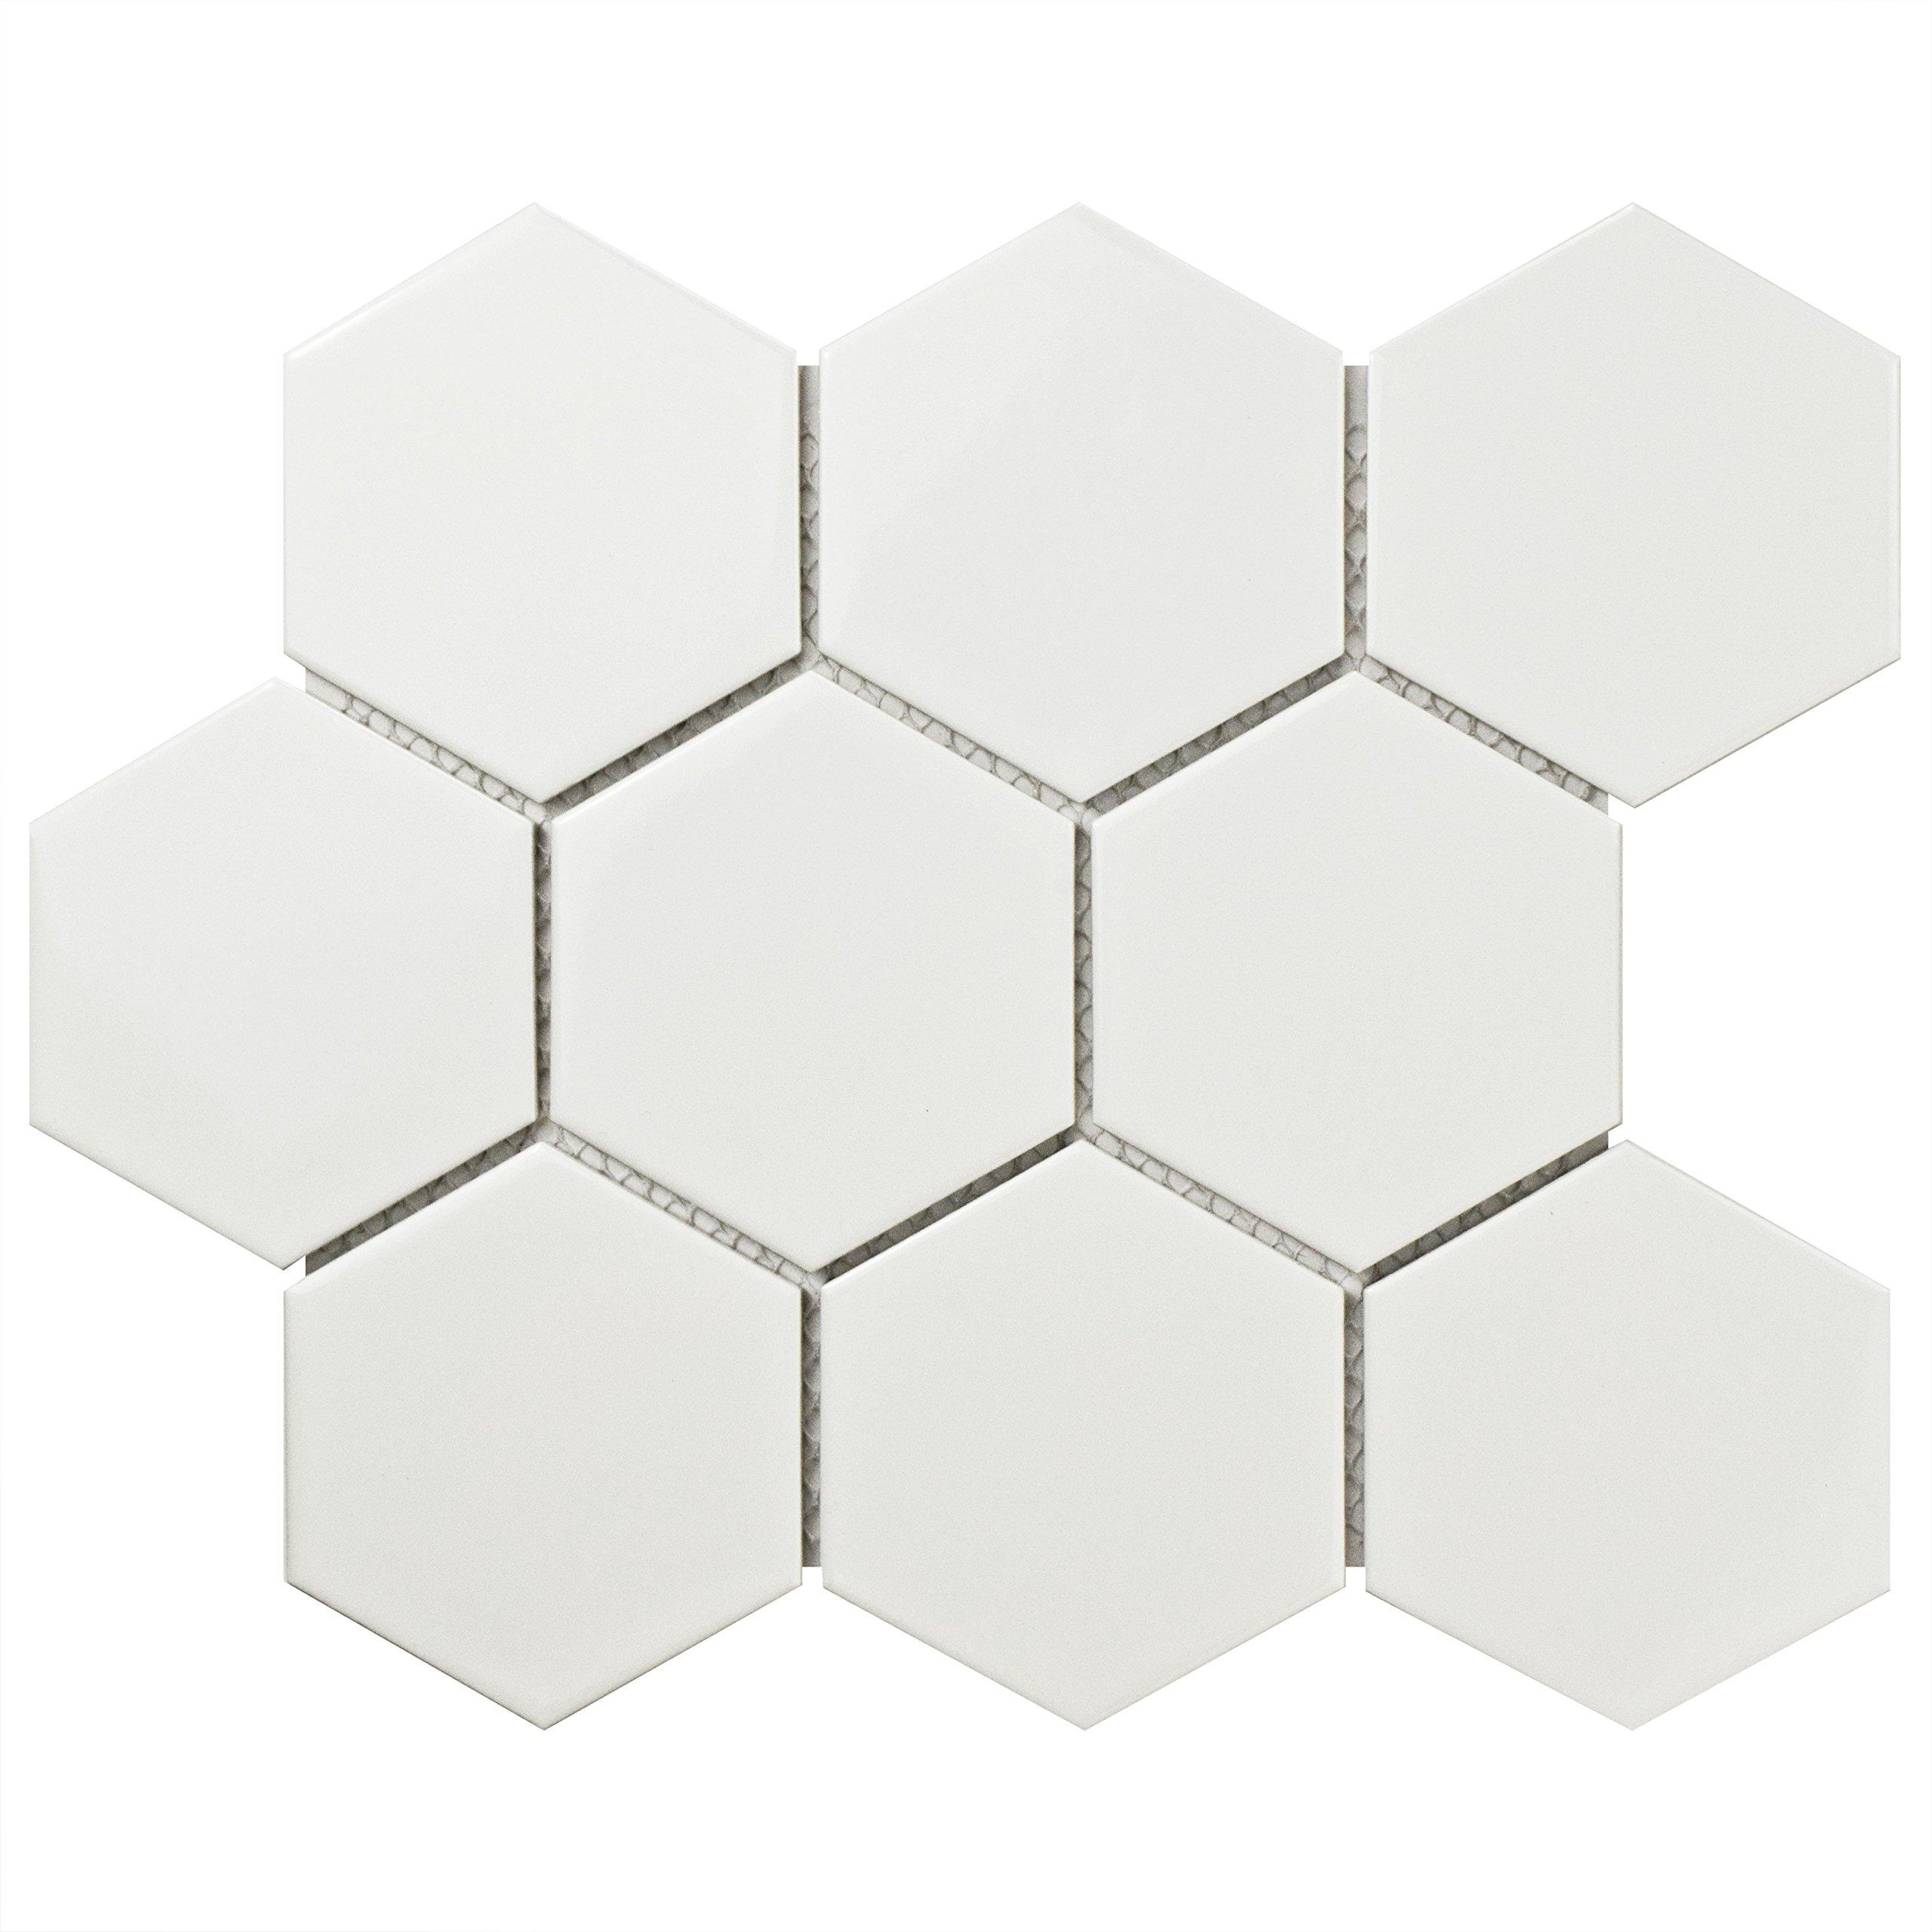 SomerTile FWRM4HGW Retro Super Hex Porcelain Mosaic Floor & Wall Tile, 10'' x 11.5'', Glossy White, 10 Piece